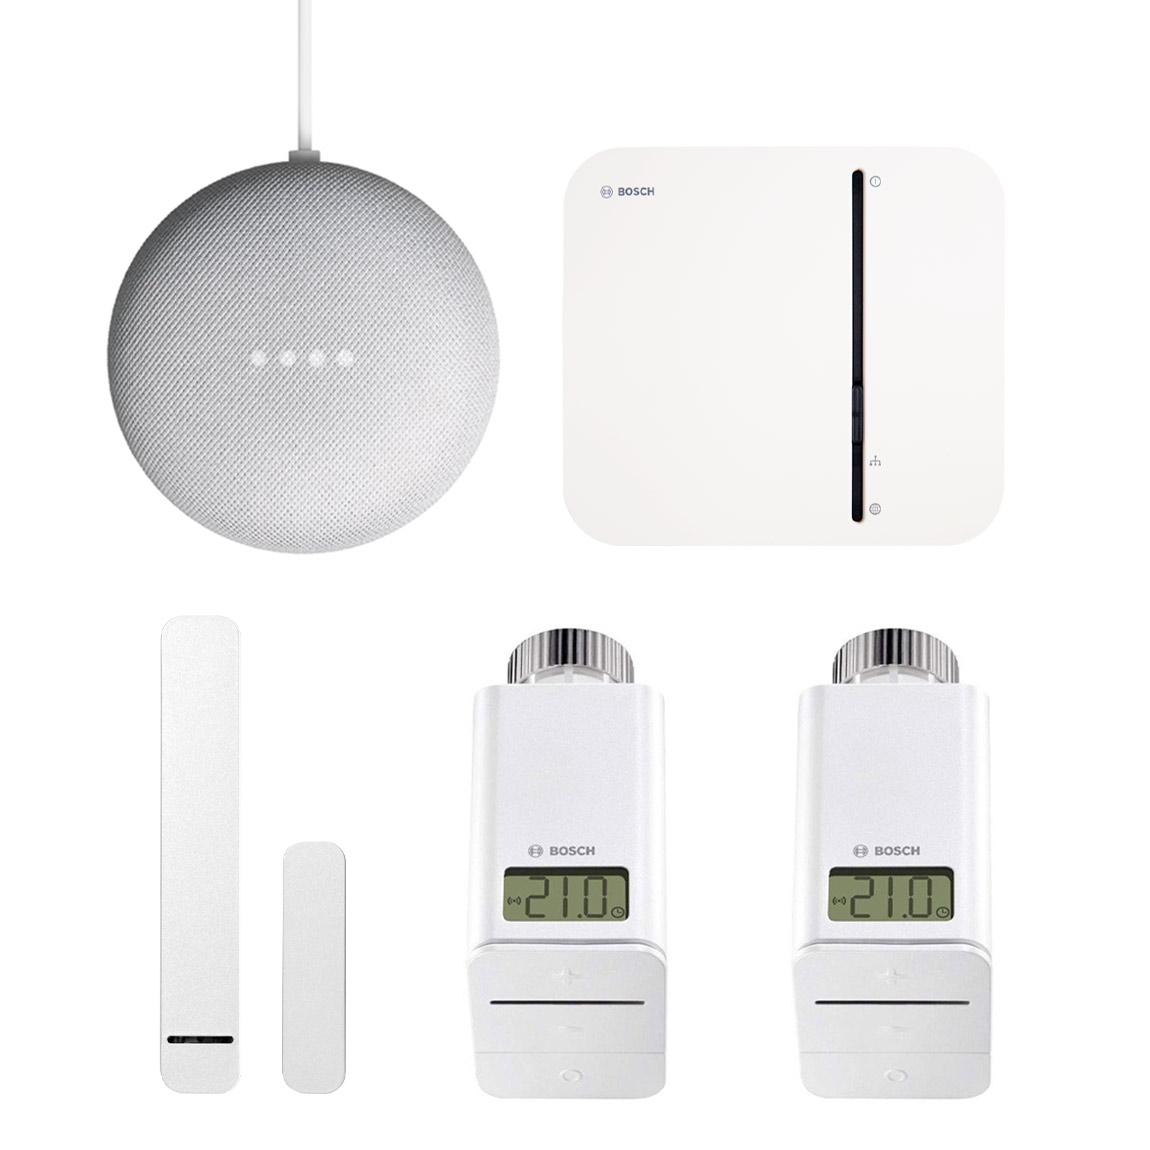 Bosch Smart Home - Starter Set Raumklima + gratis Google Nest Mini + gratis Twinguard + Twist